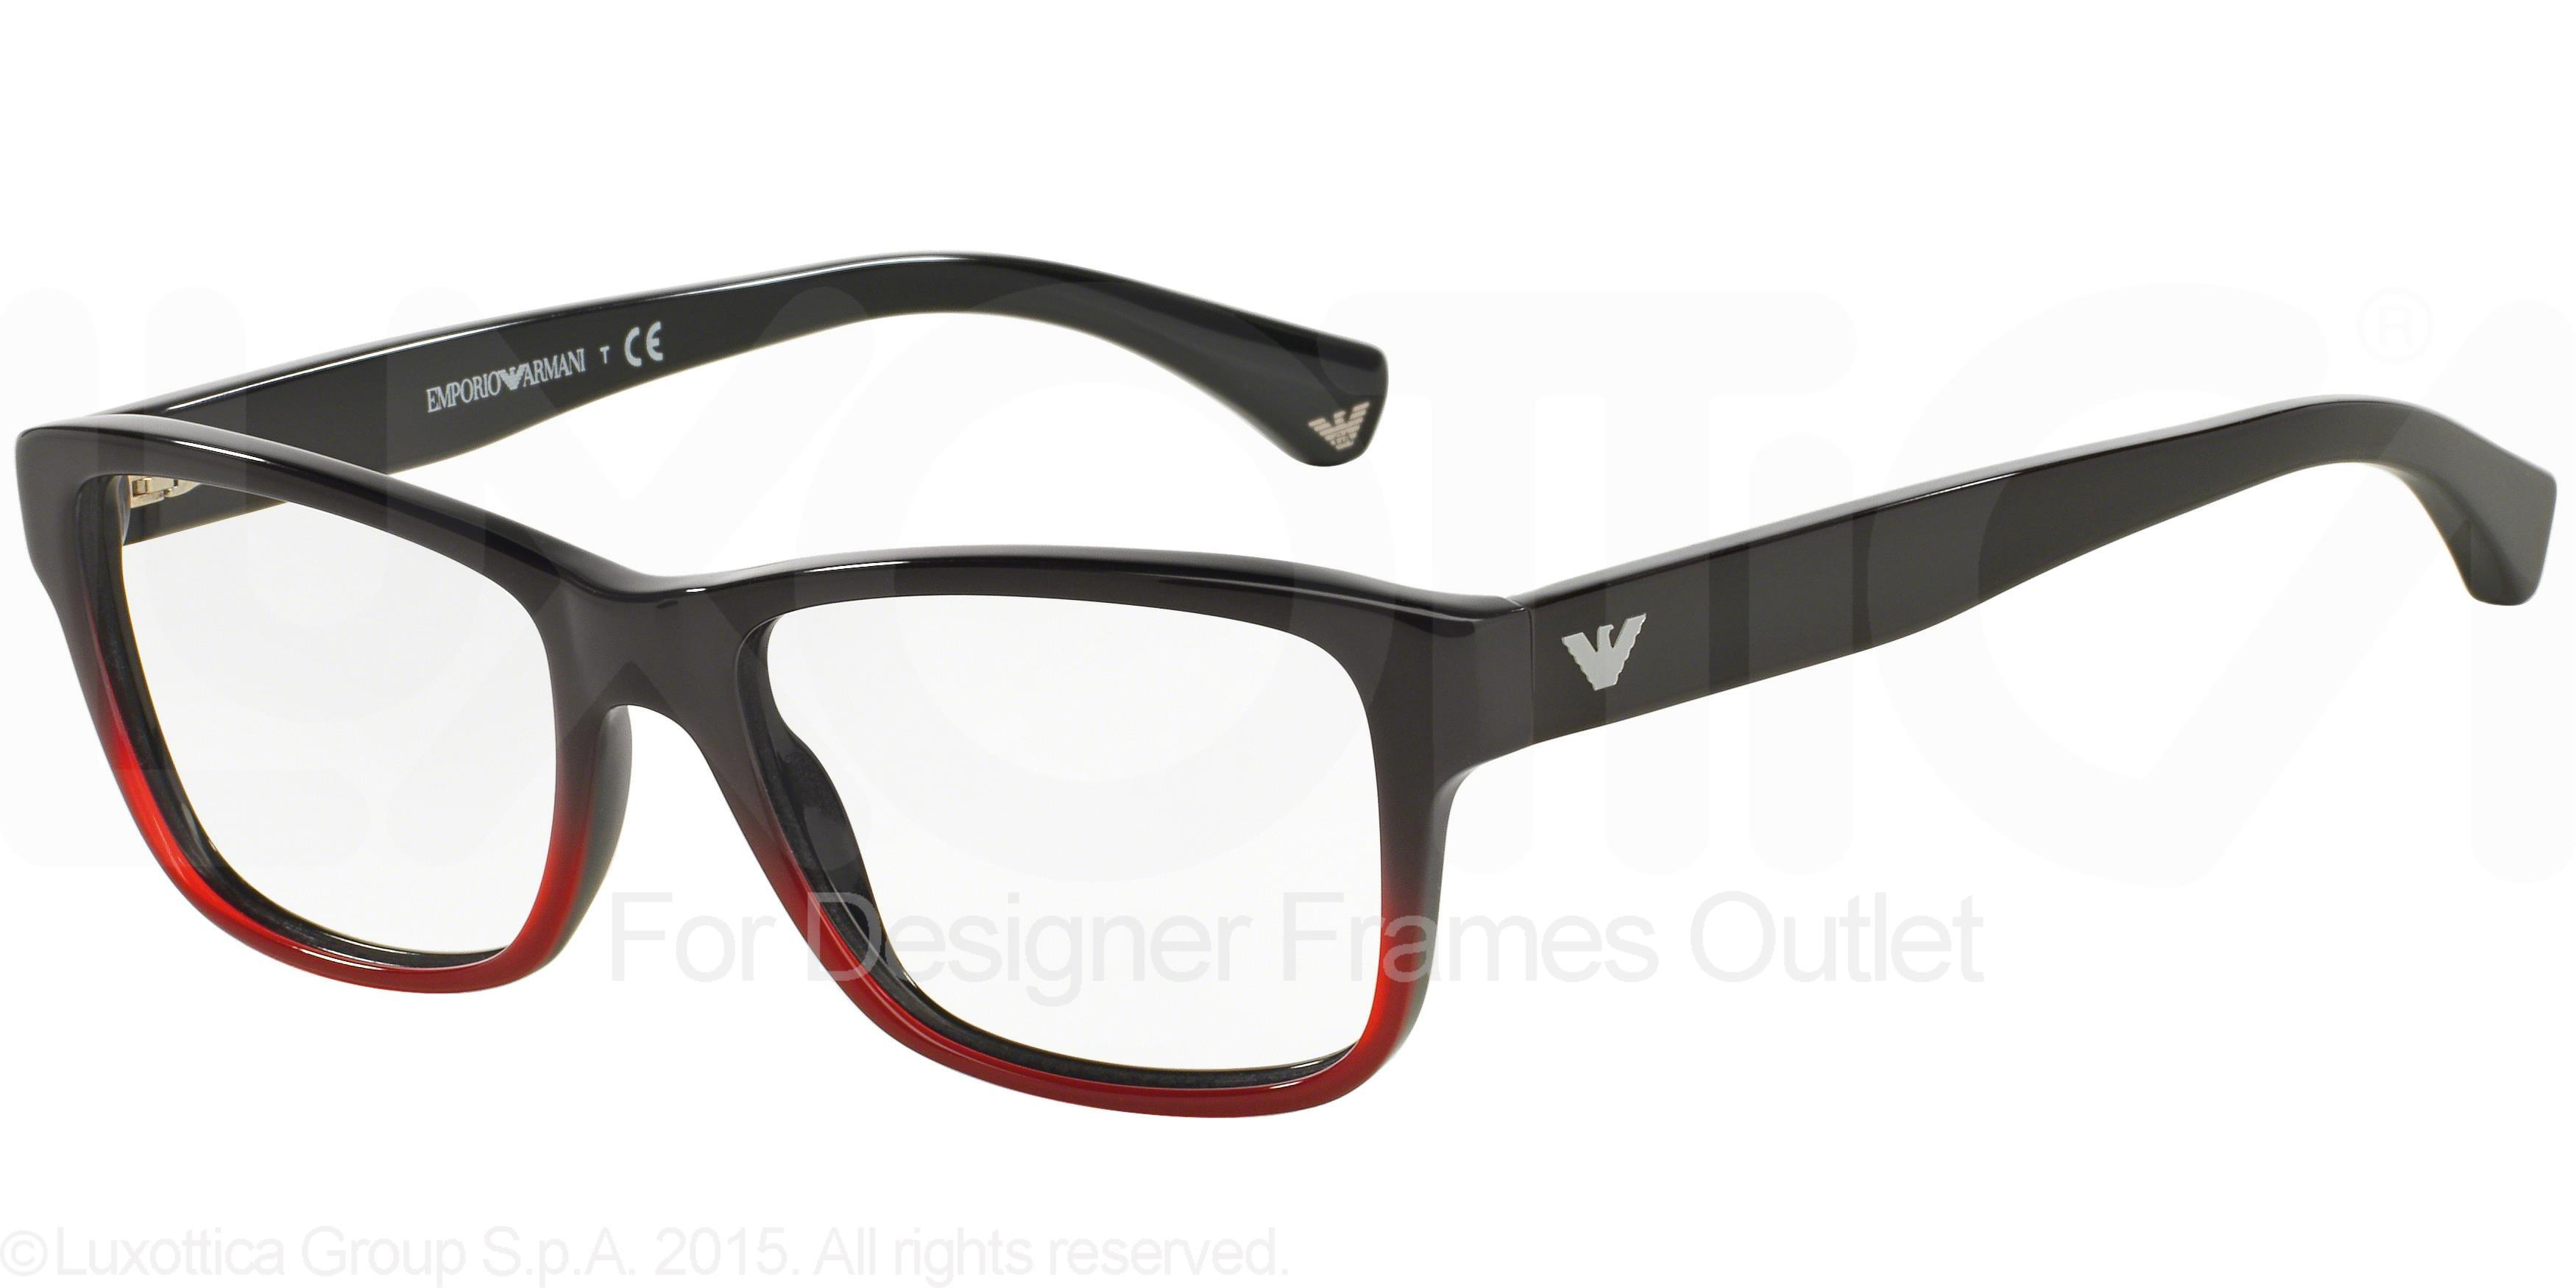 1f299f854c Designer Frames Outlet. Emporio Armani EA3051F